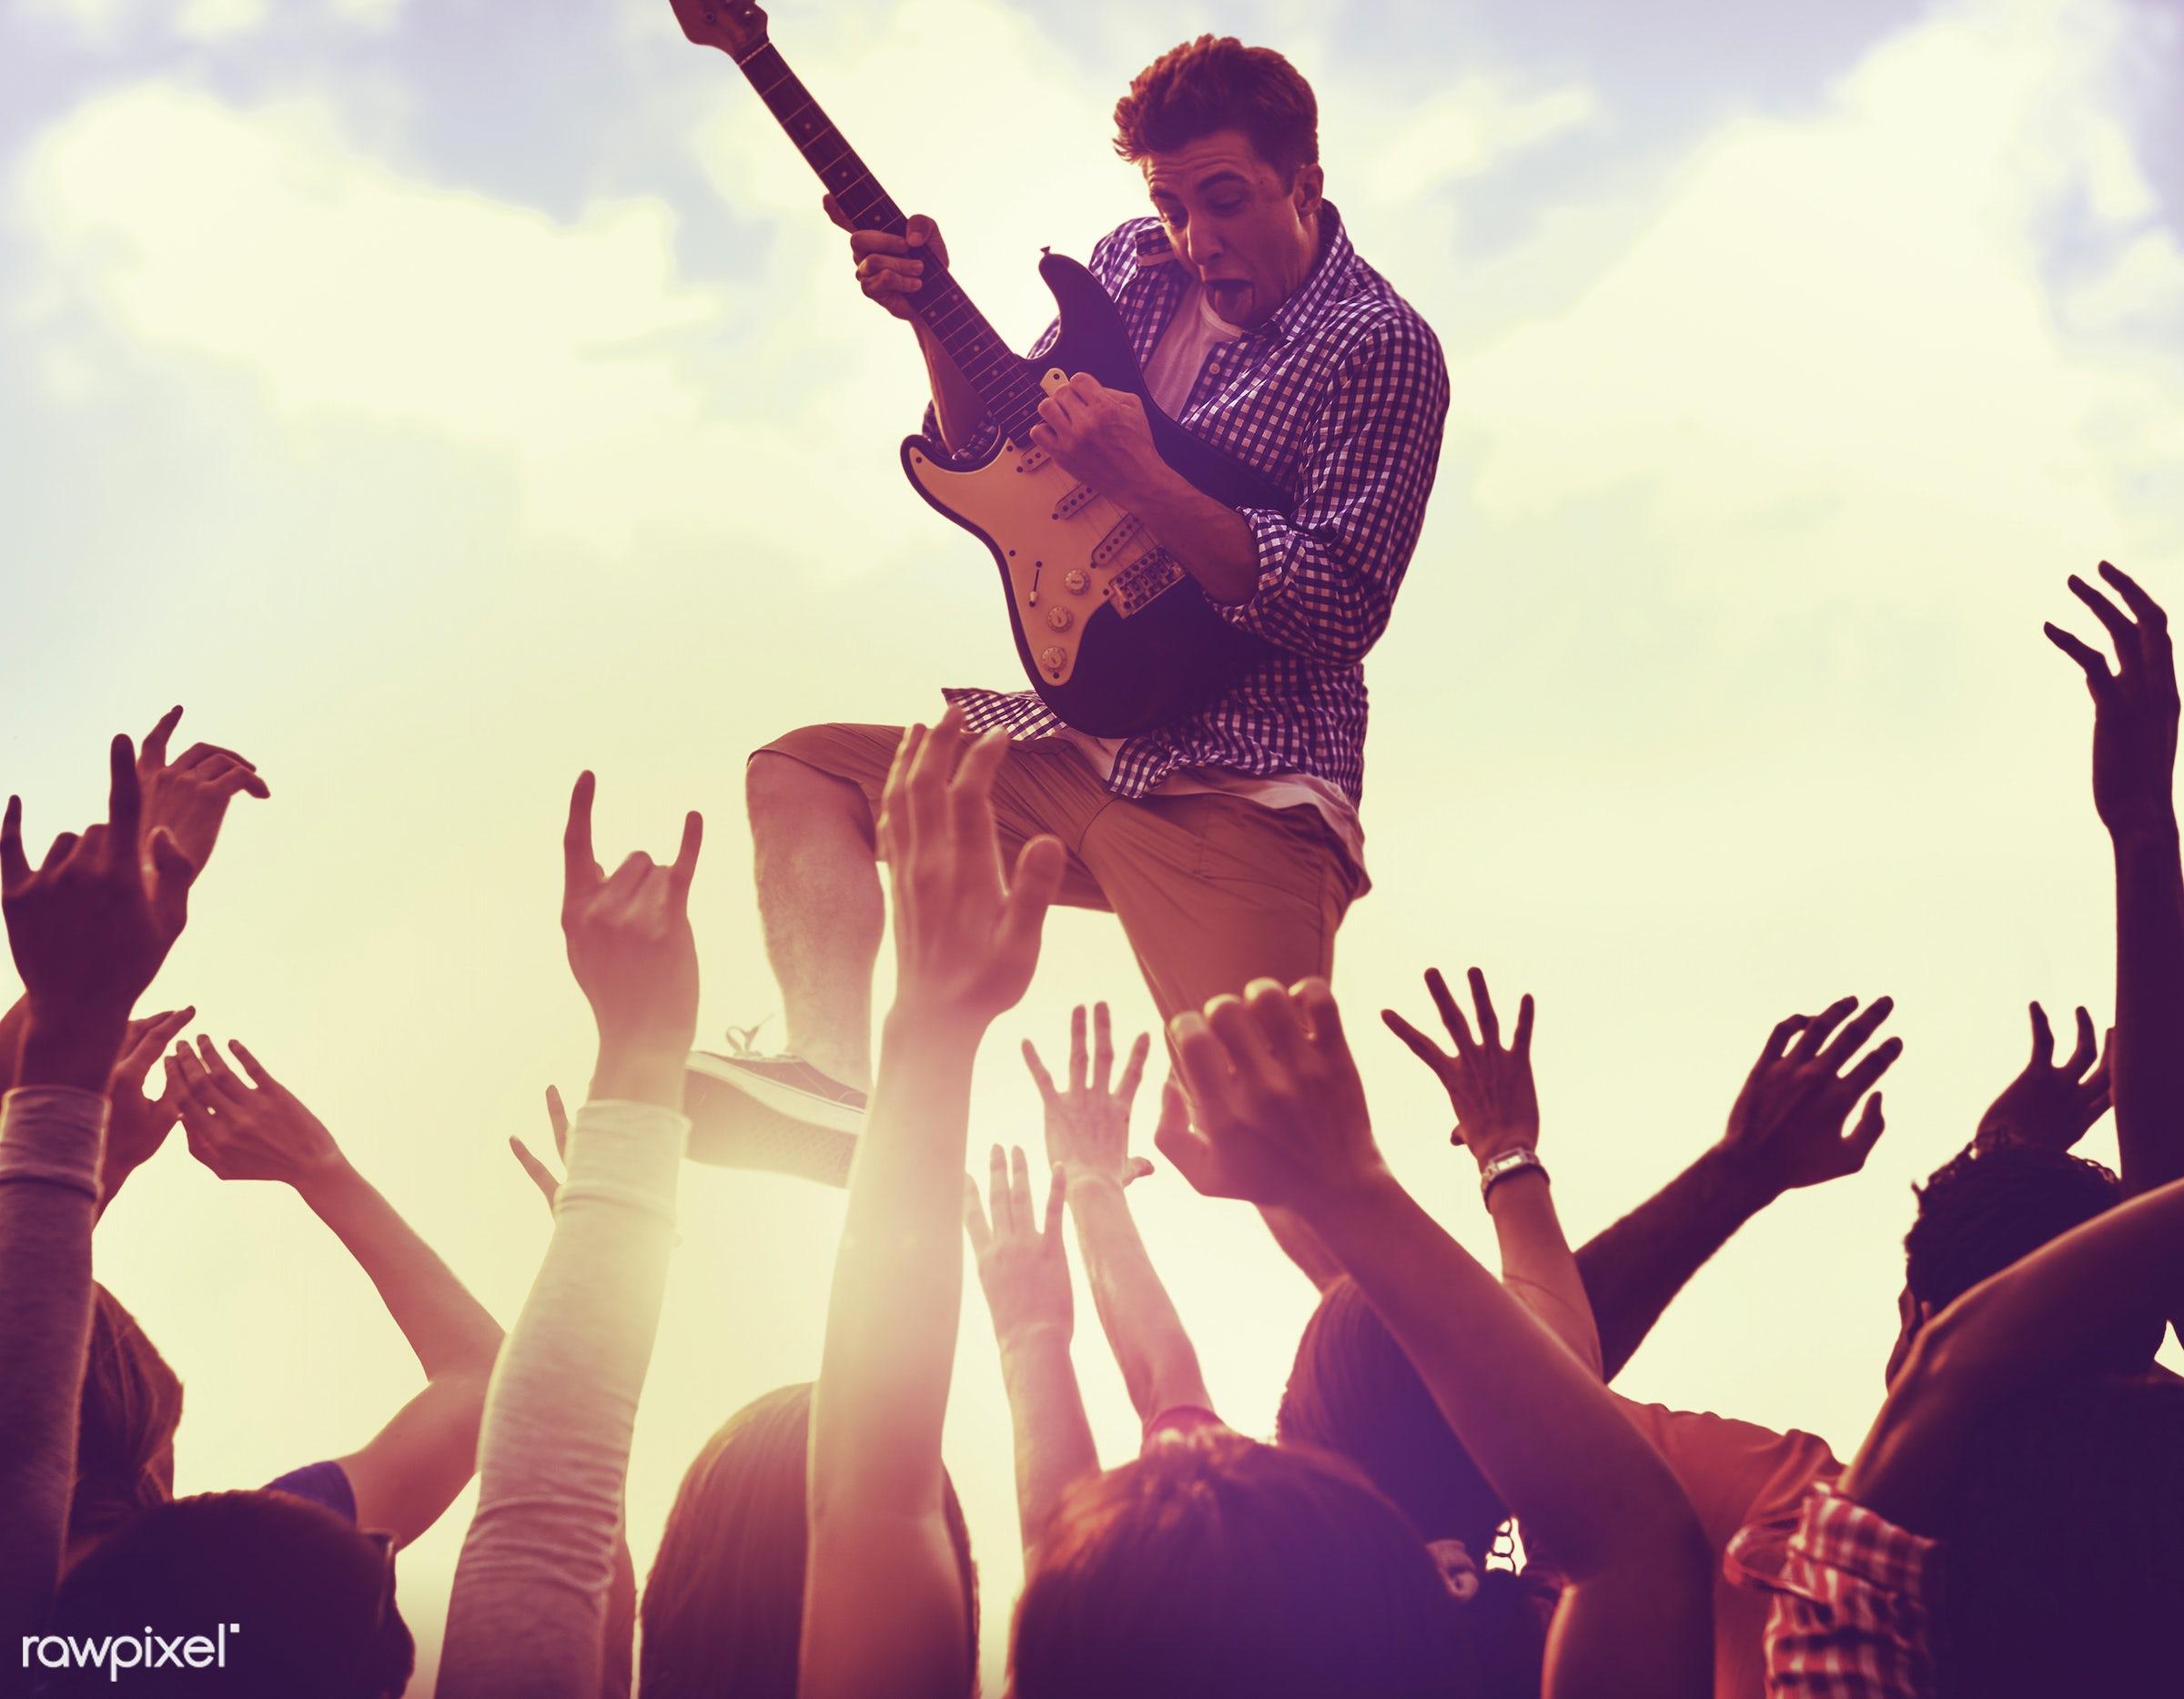 adolescence, audience, carefree, celebration, cheerful, cloud, cloudscape, concert, dancing, ecstatic, enjoyment, excitement...